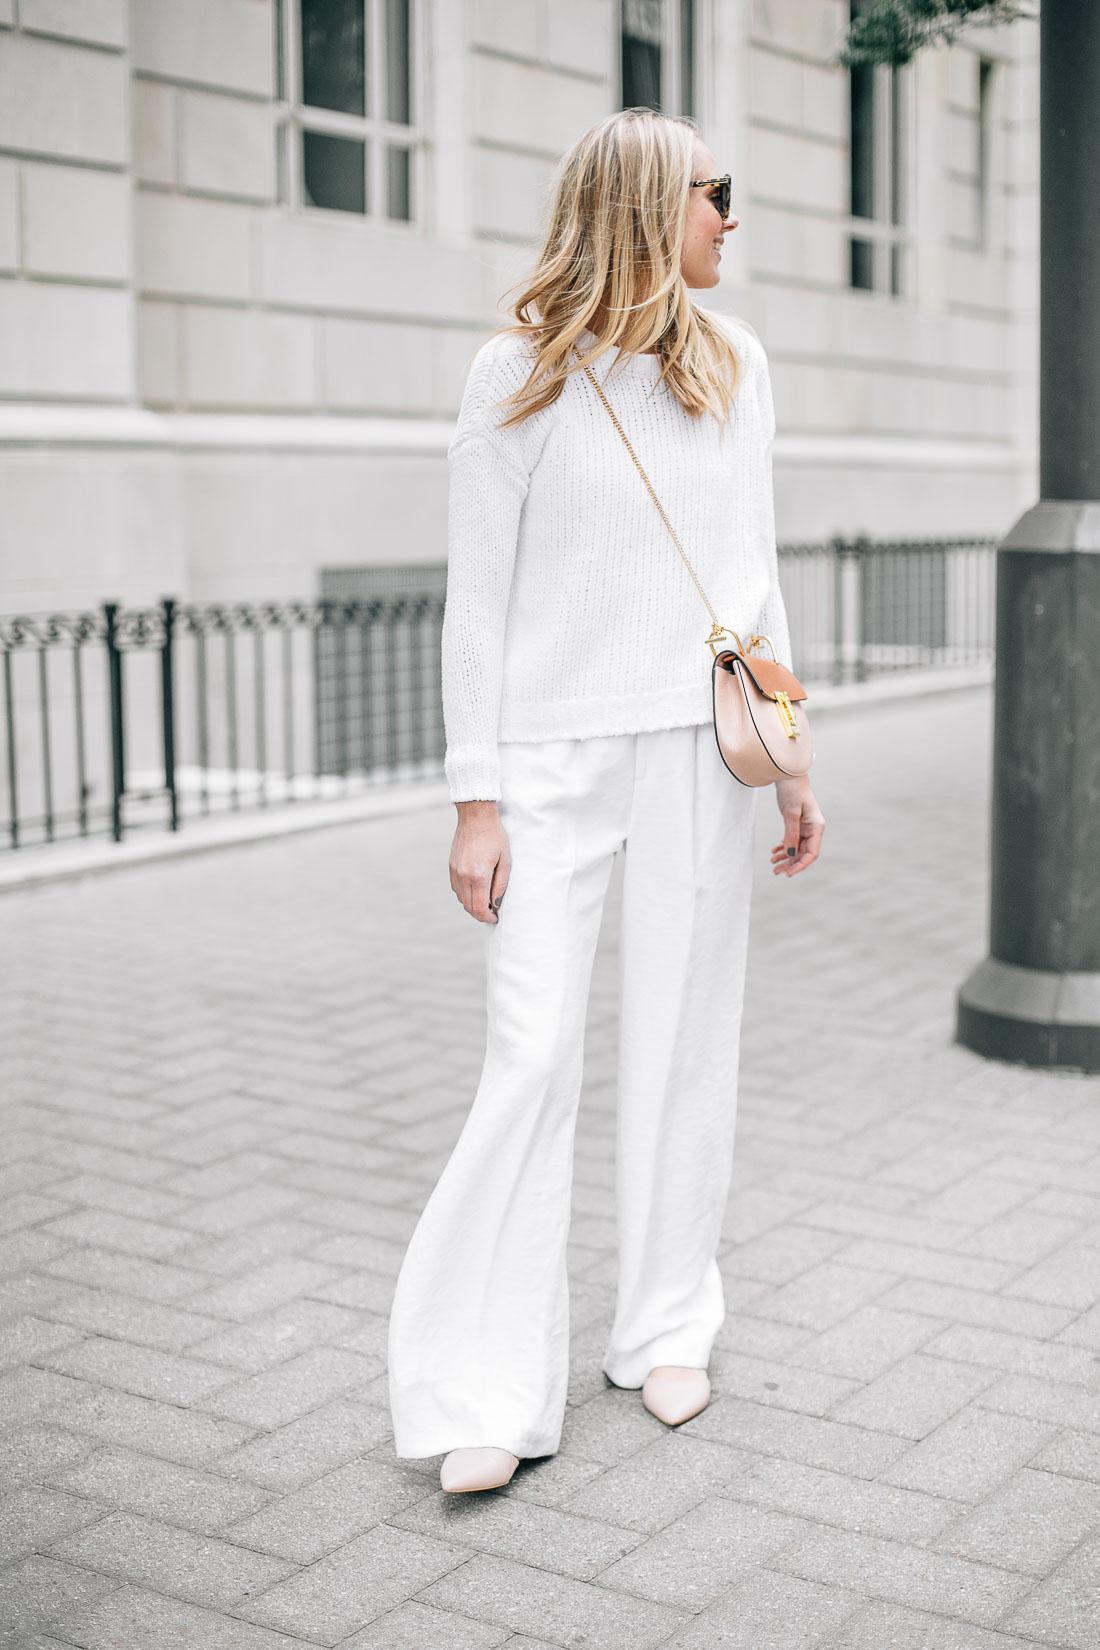 fashion-jackson-chloe-drew-handbag-pink-flats-white-sweater-white-wide-leg-pants